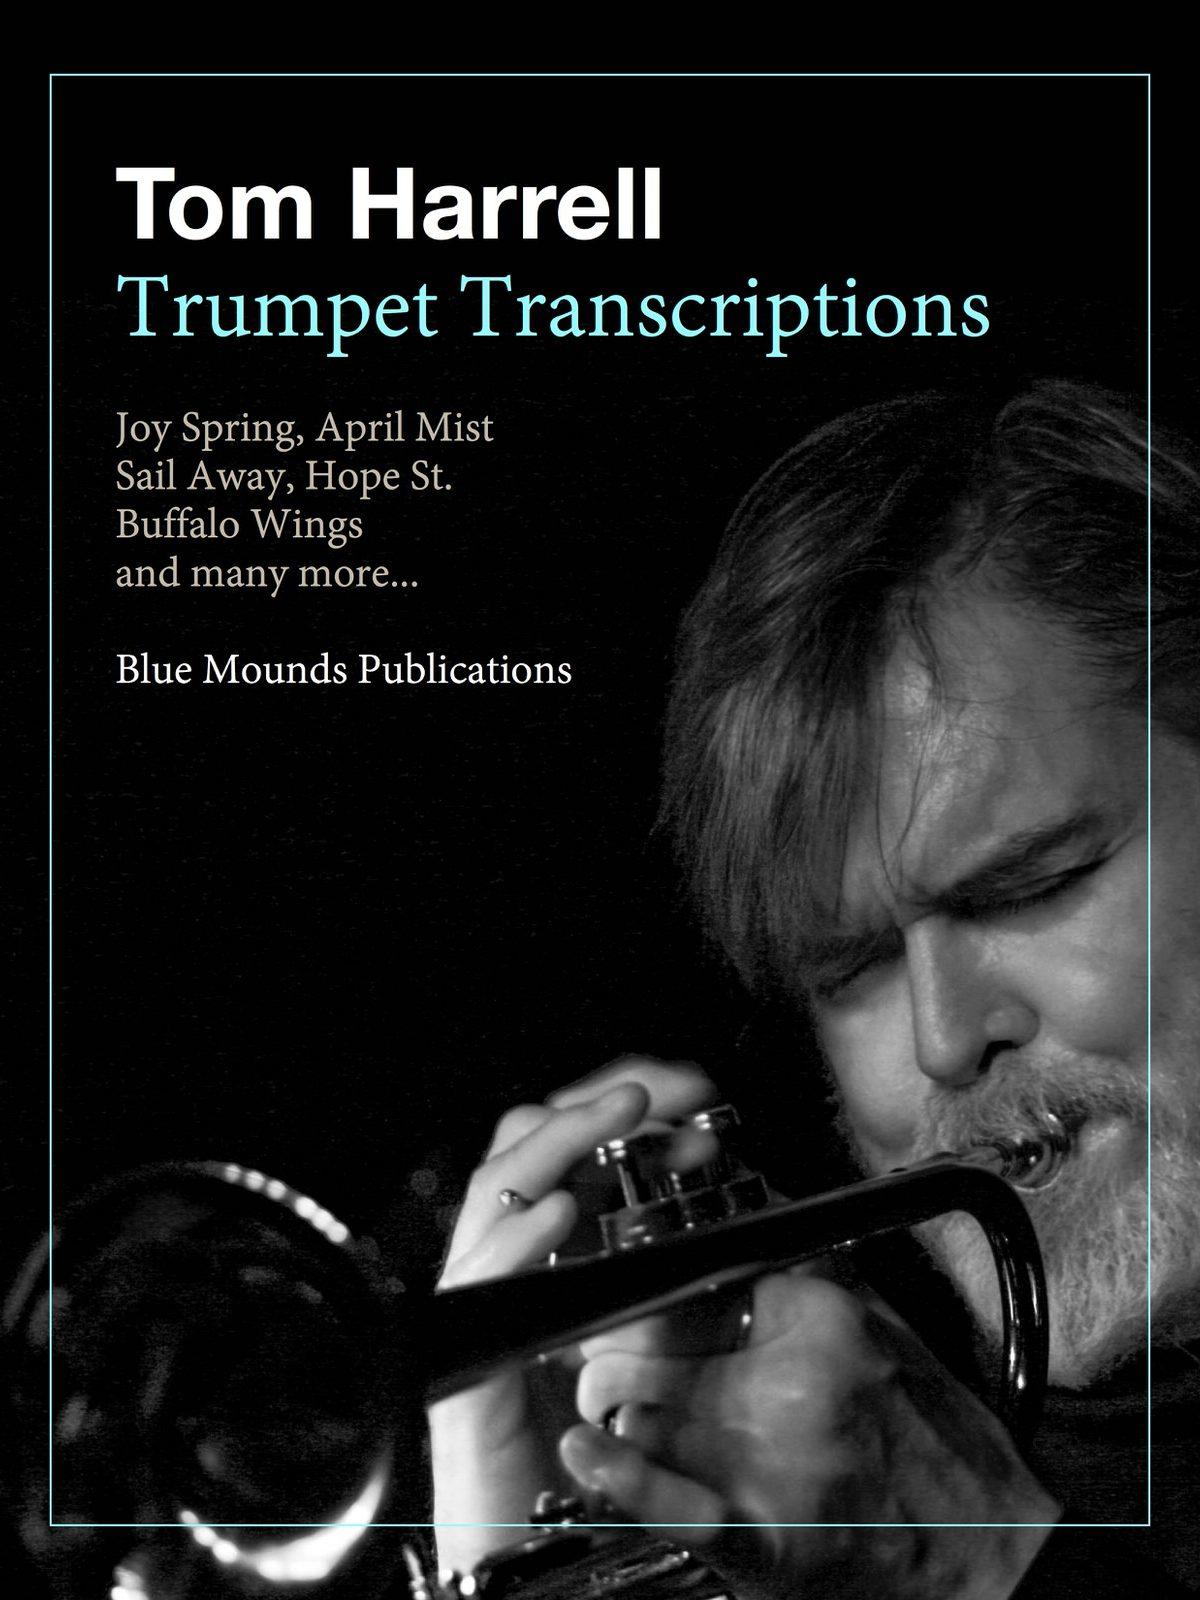 Tom Harrell Trumpet Transcriptions